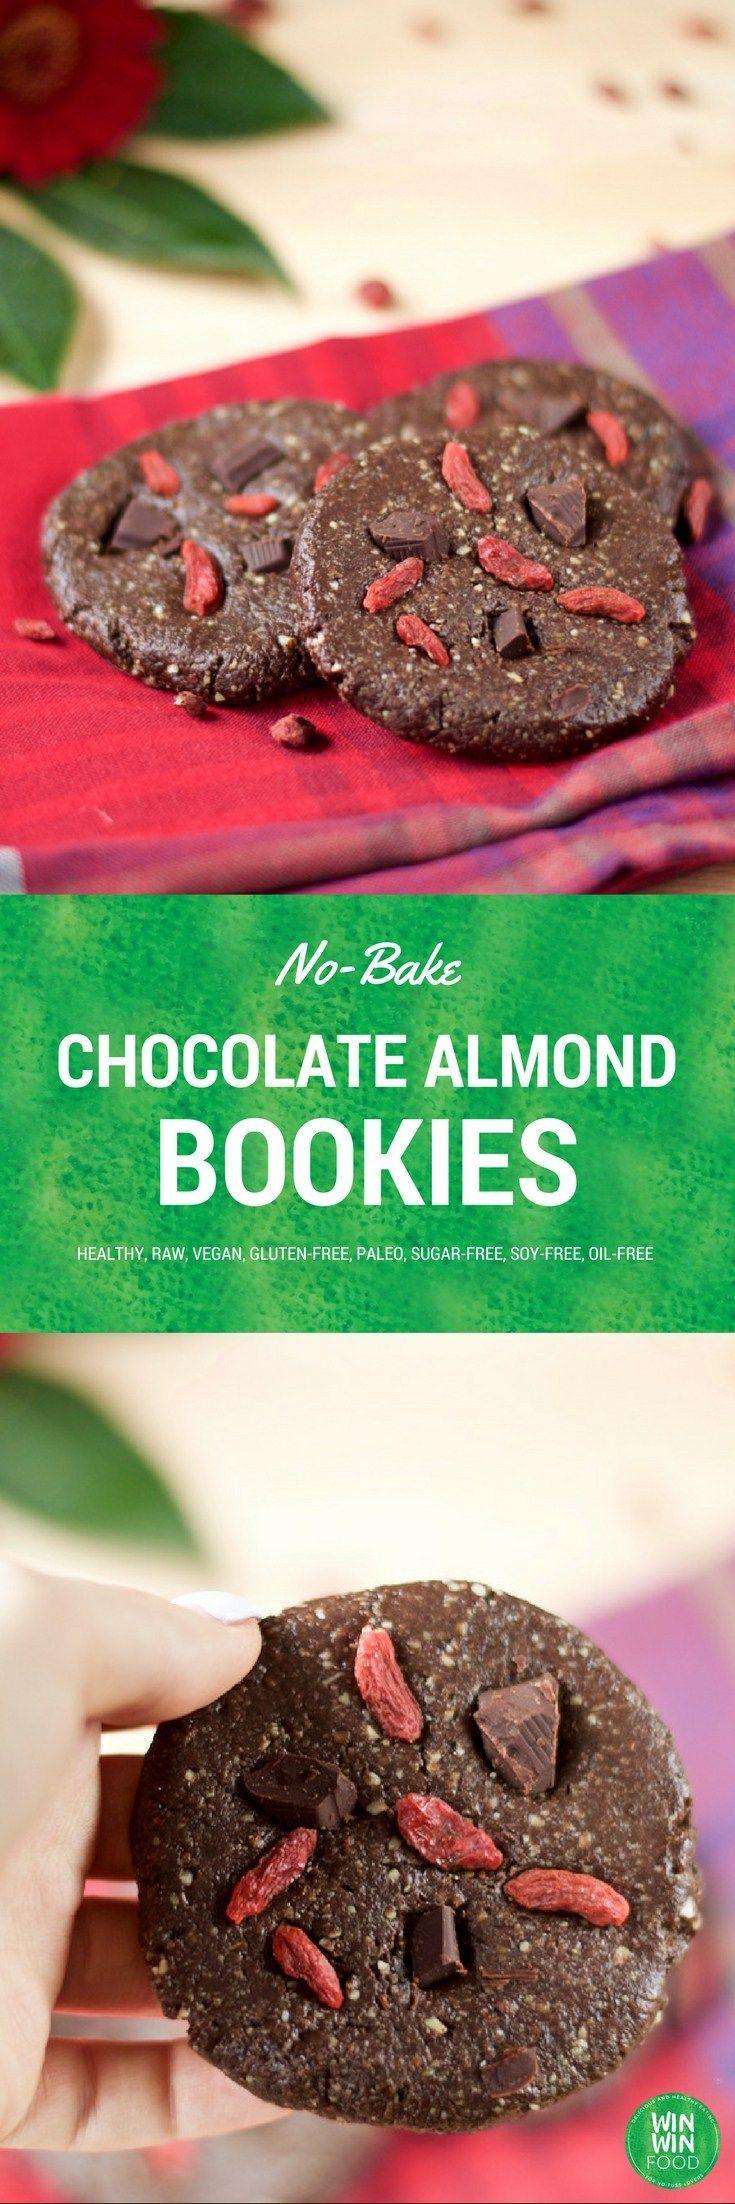 No-Bake Chocolate Almond Cookies   WIN-WINFOOD.com #healthy #vegan #glutenfree…